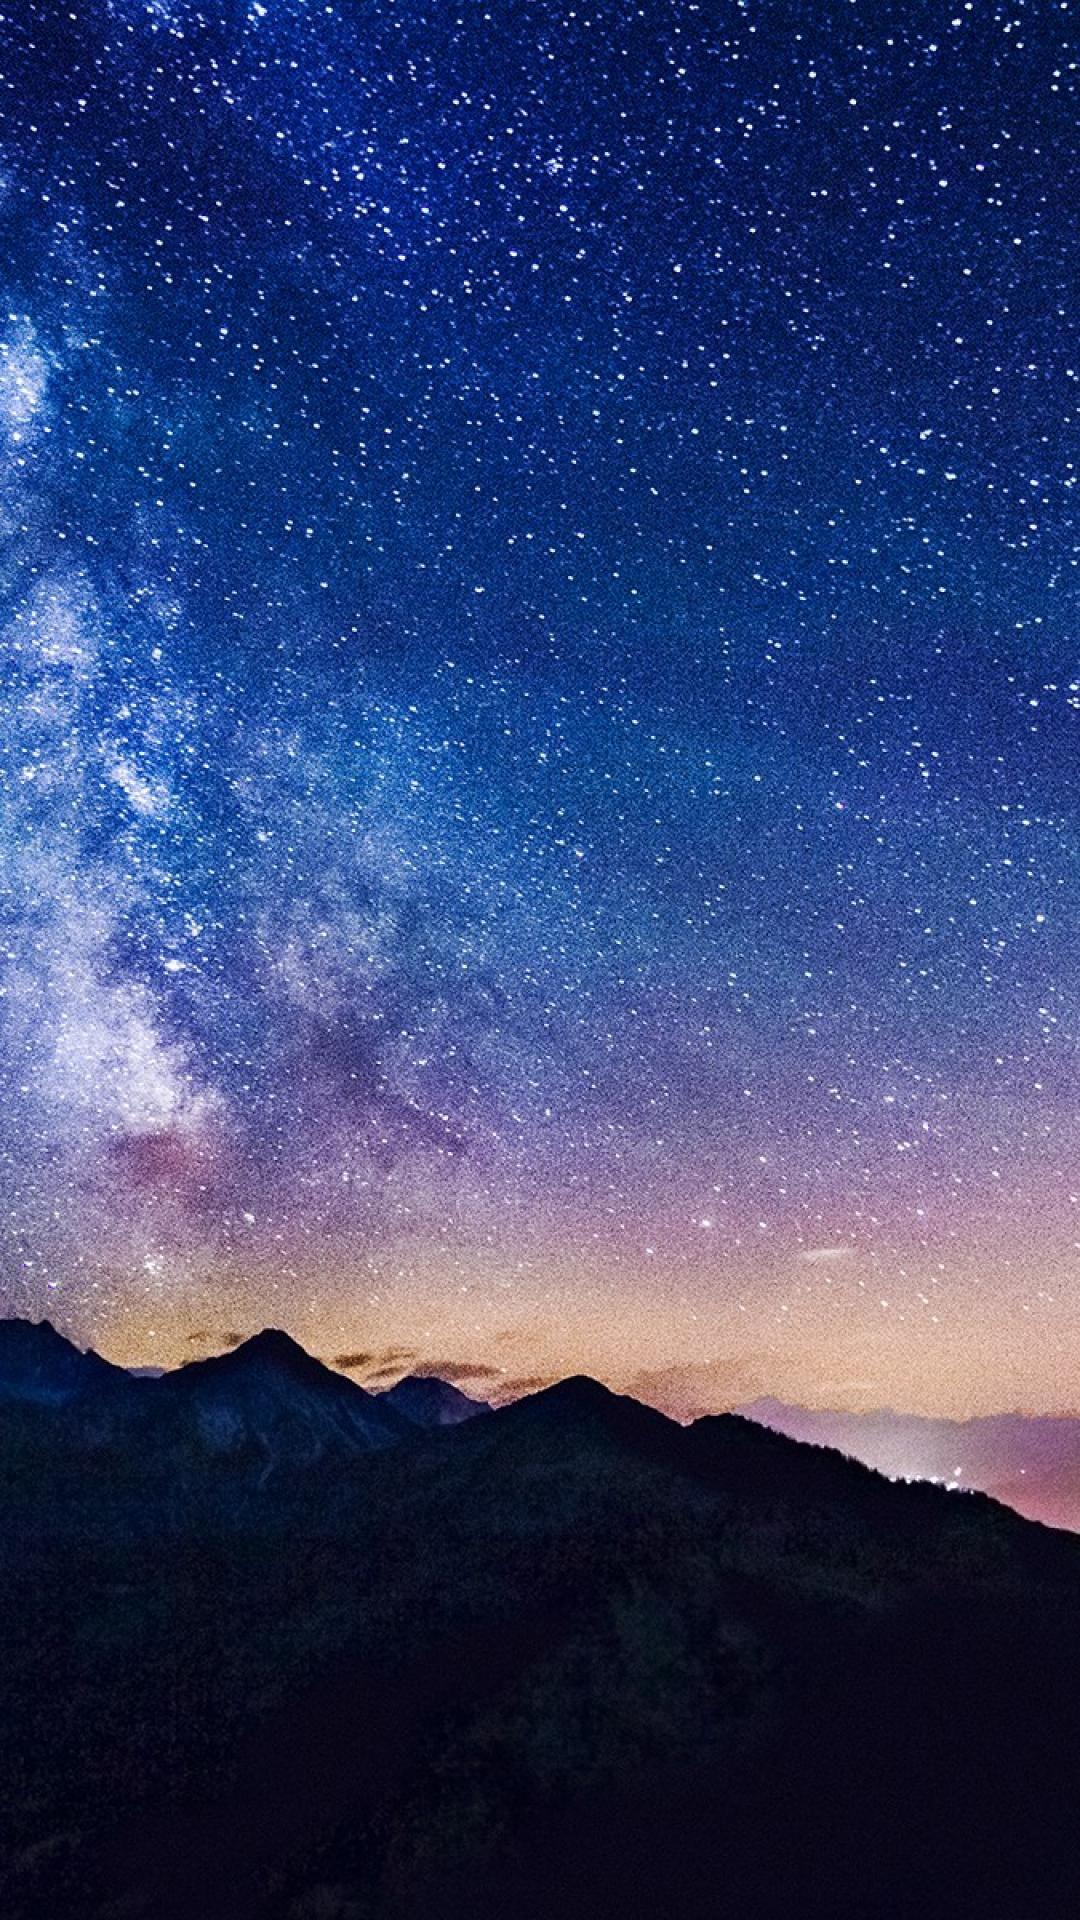 夜空の星 星 画像 星 壁紙 夜空